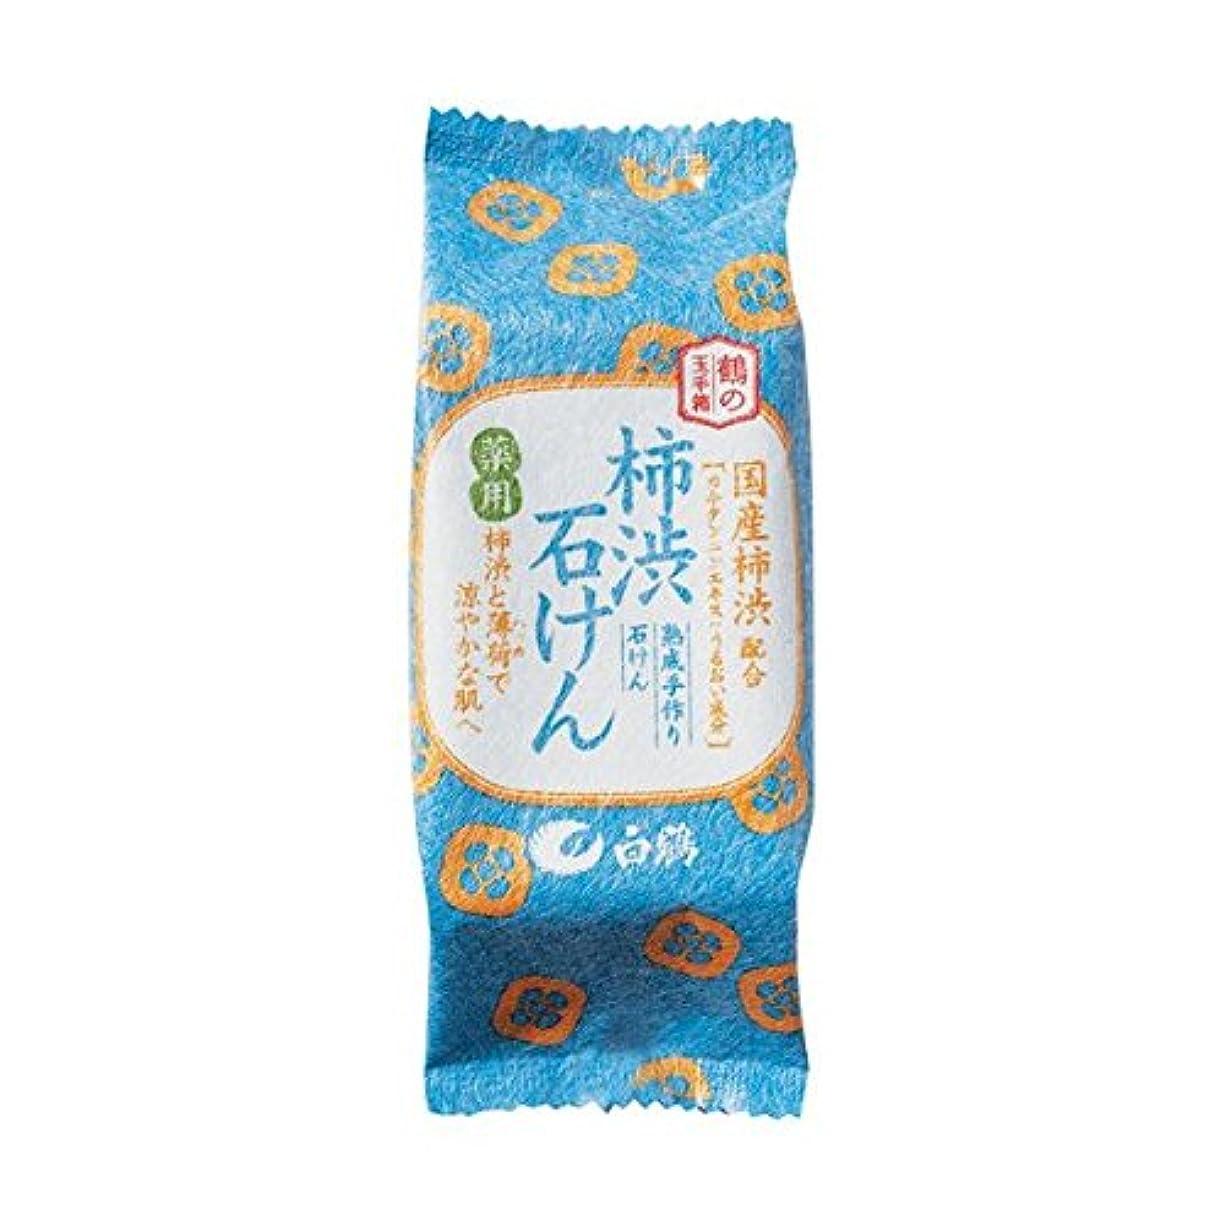 倉庫化粧評決白鶴 鶴の玉手箱 薬用 柿渋石けん 110g × 3個